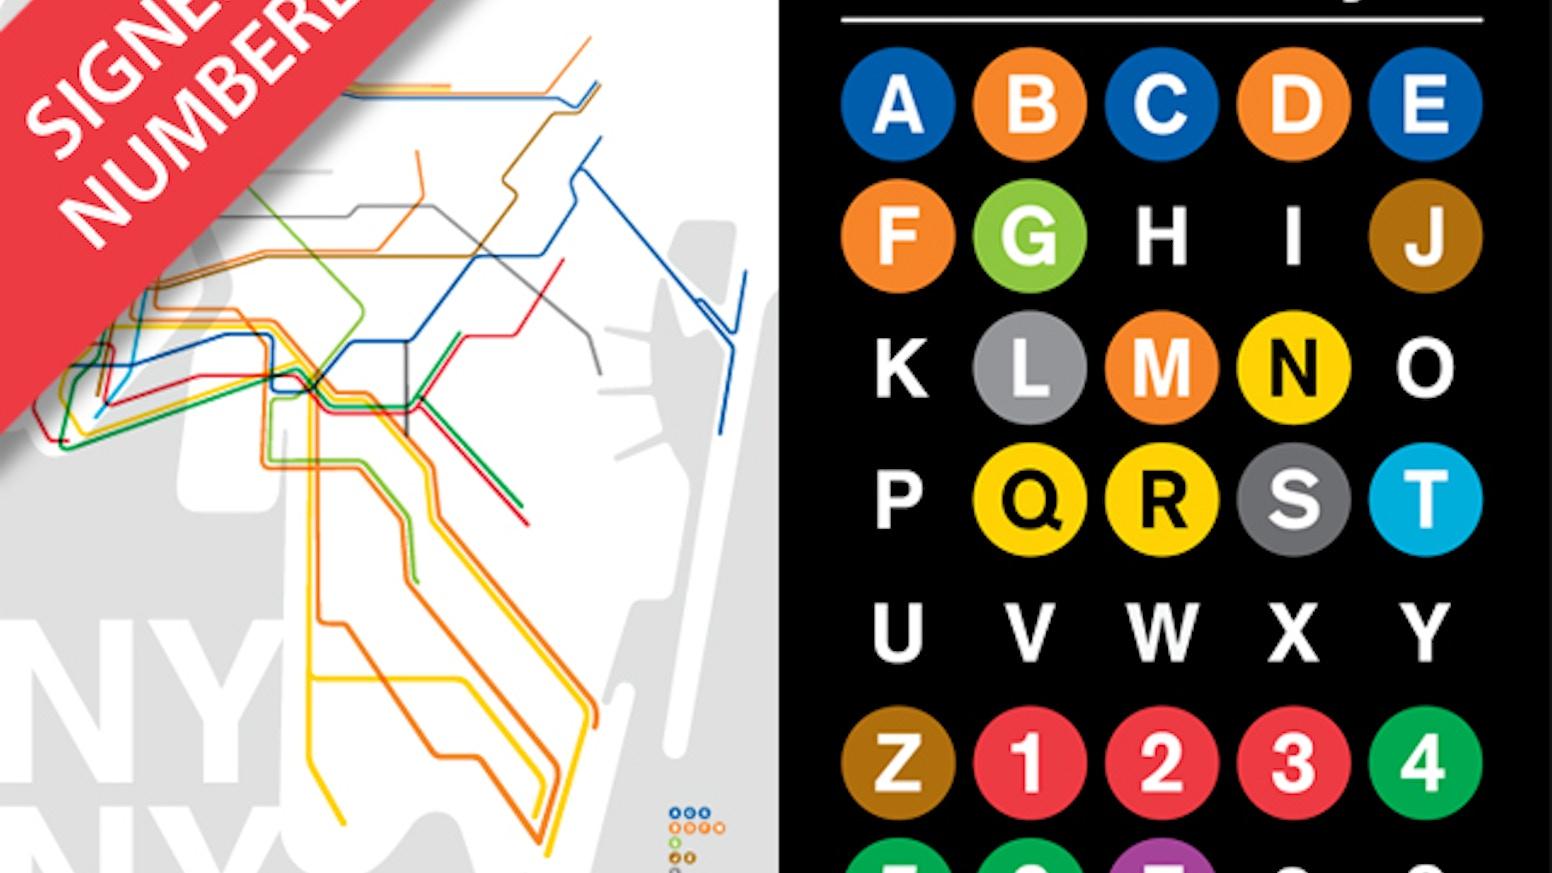 Nyc subway poster size art prints by jody williams kickstarter nyc subway poster size art prints biocorpaavc Gallery